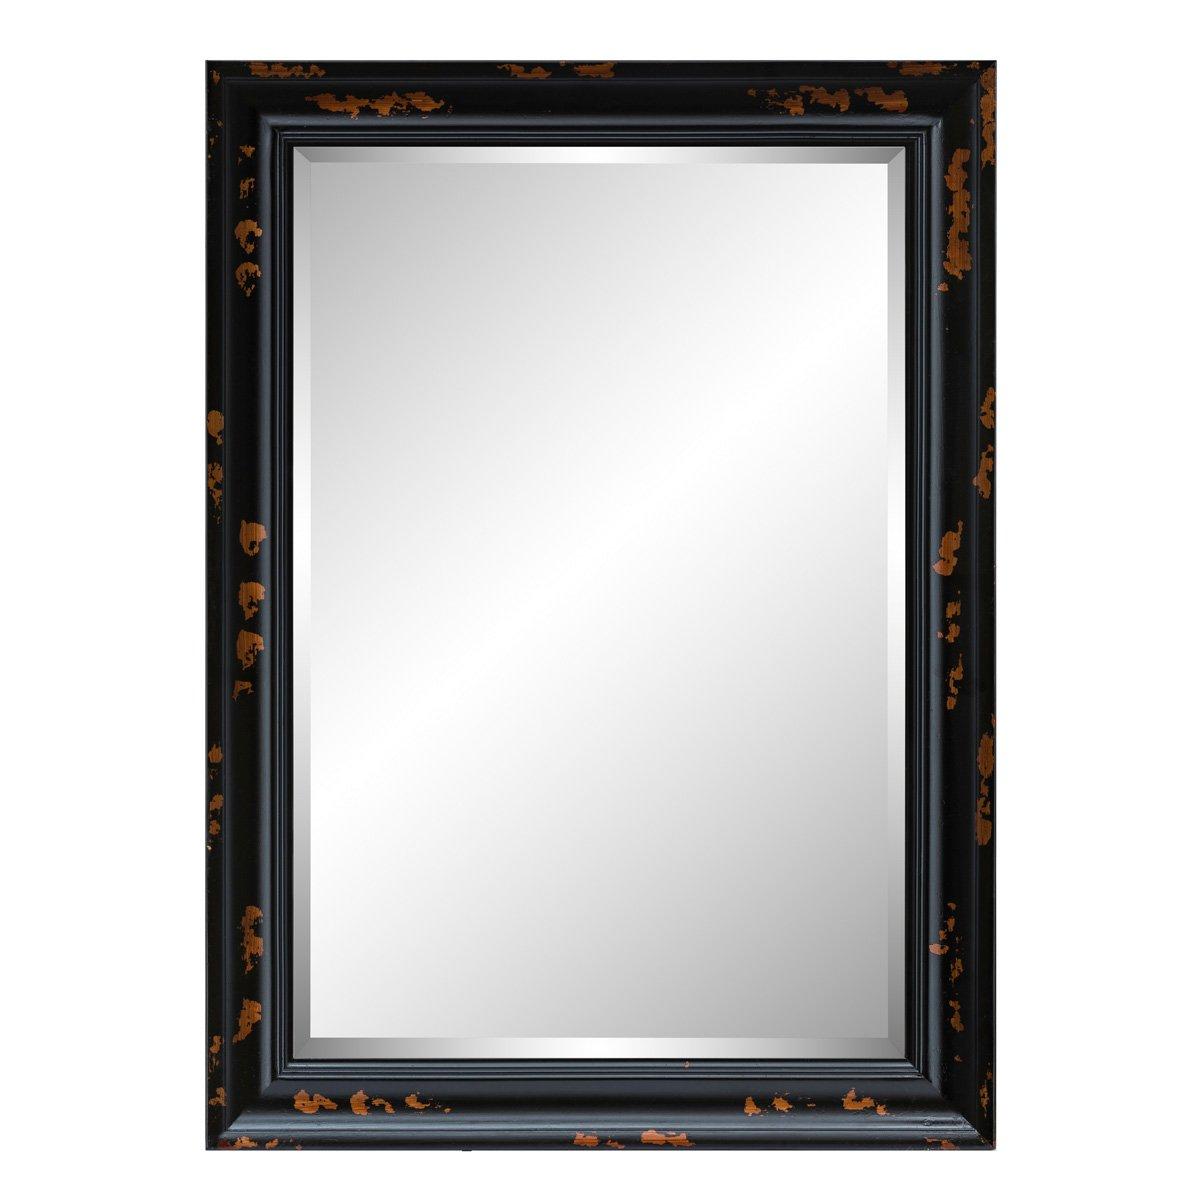 Espejo home nature marco negro sears com mx me entiende - Espejo marco negro ...